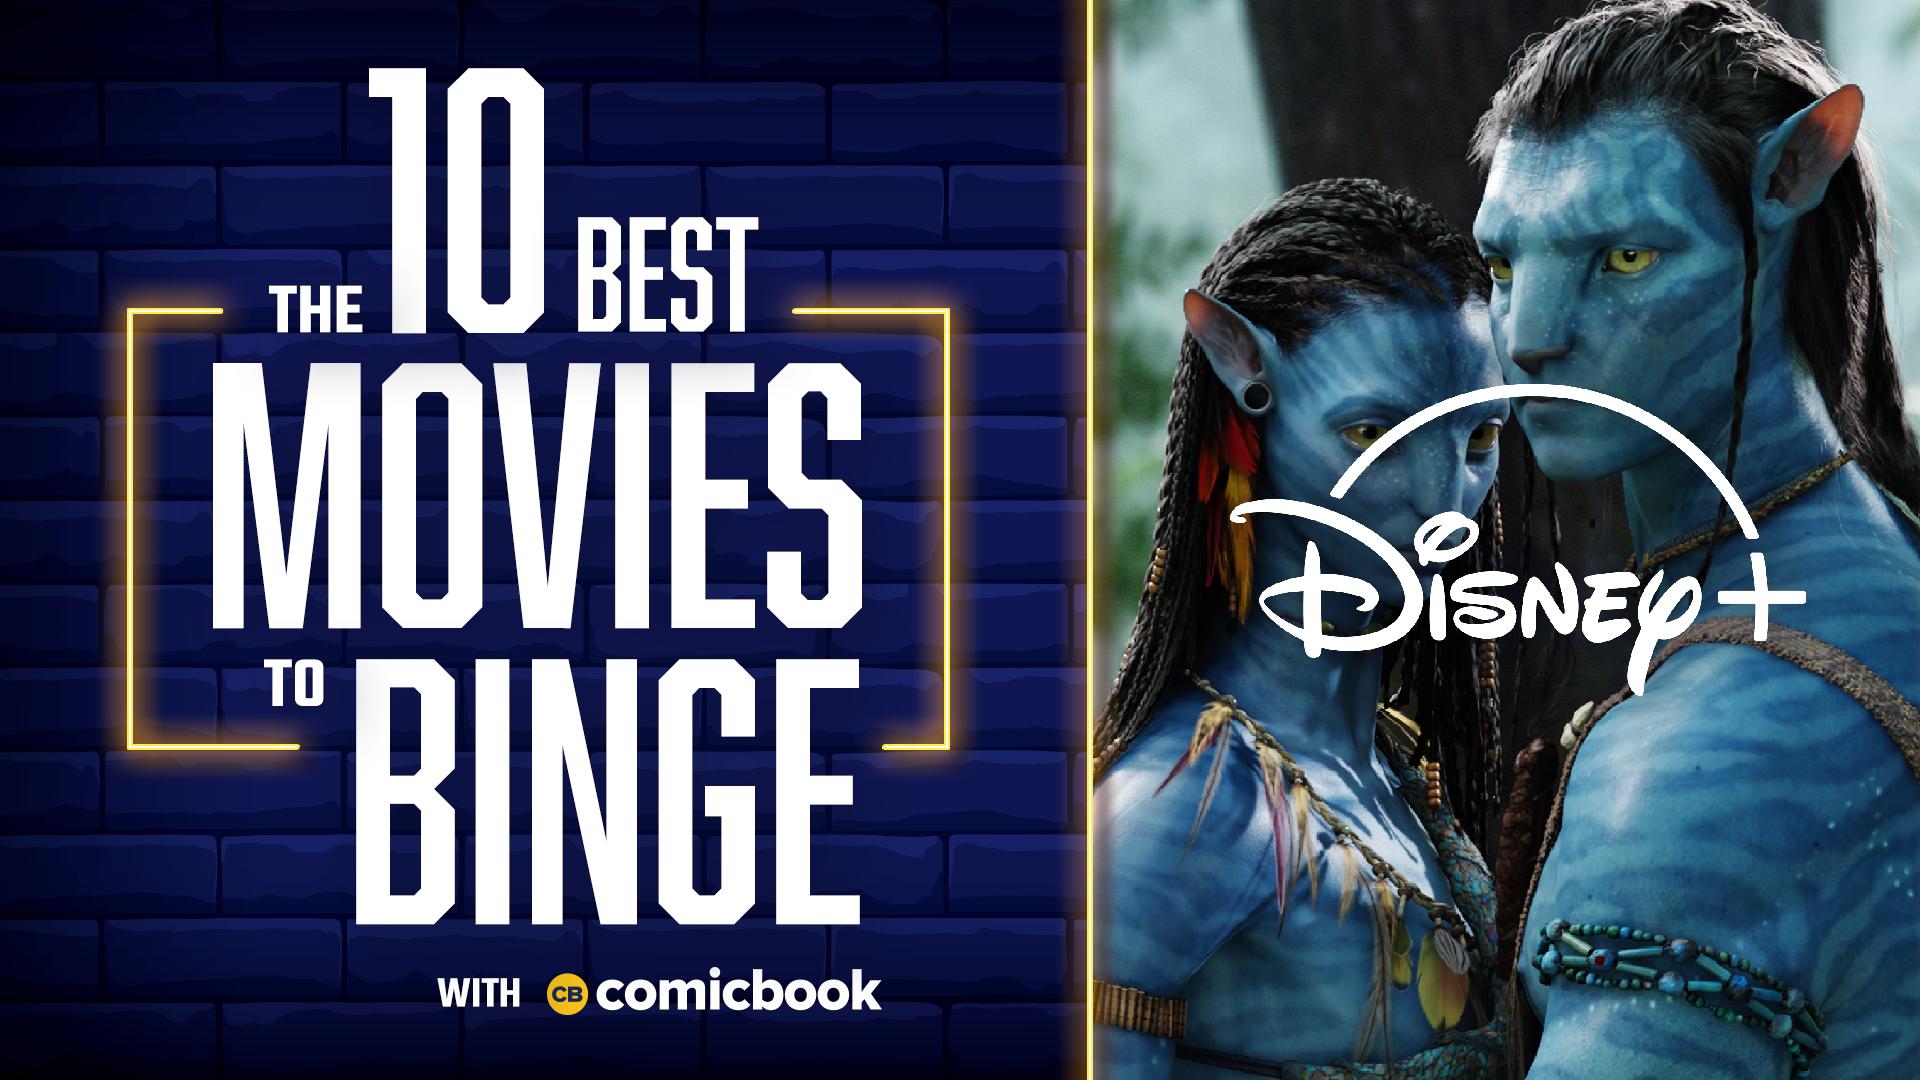 10 Best Movies to Binge on Disney+